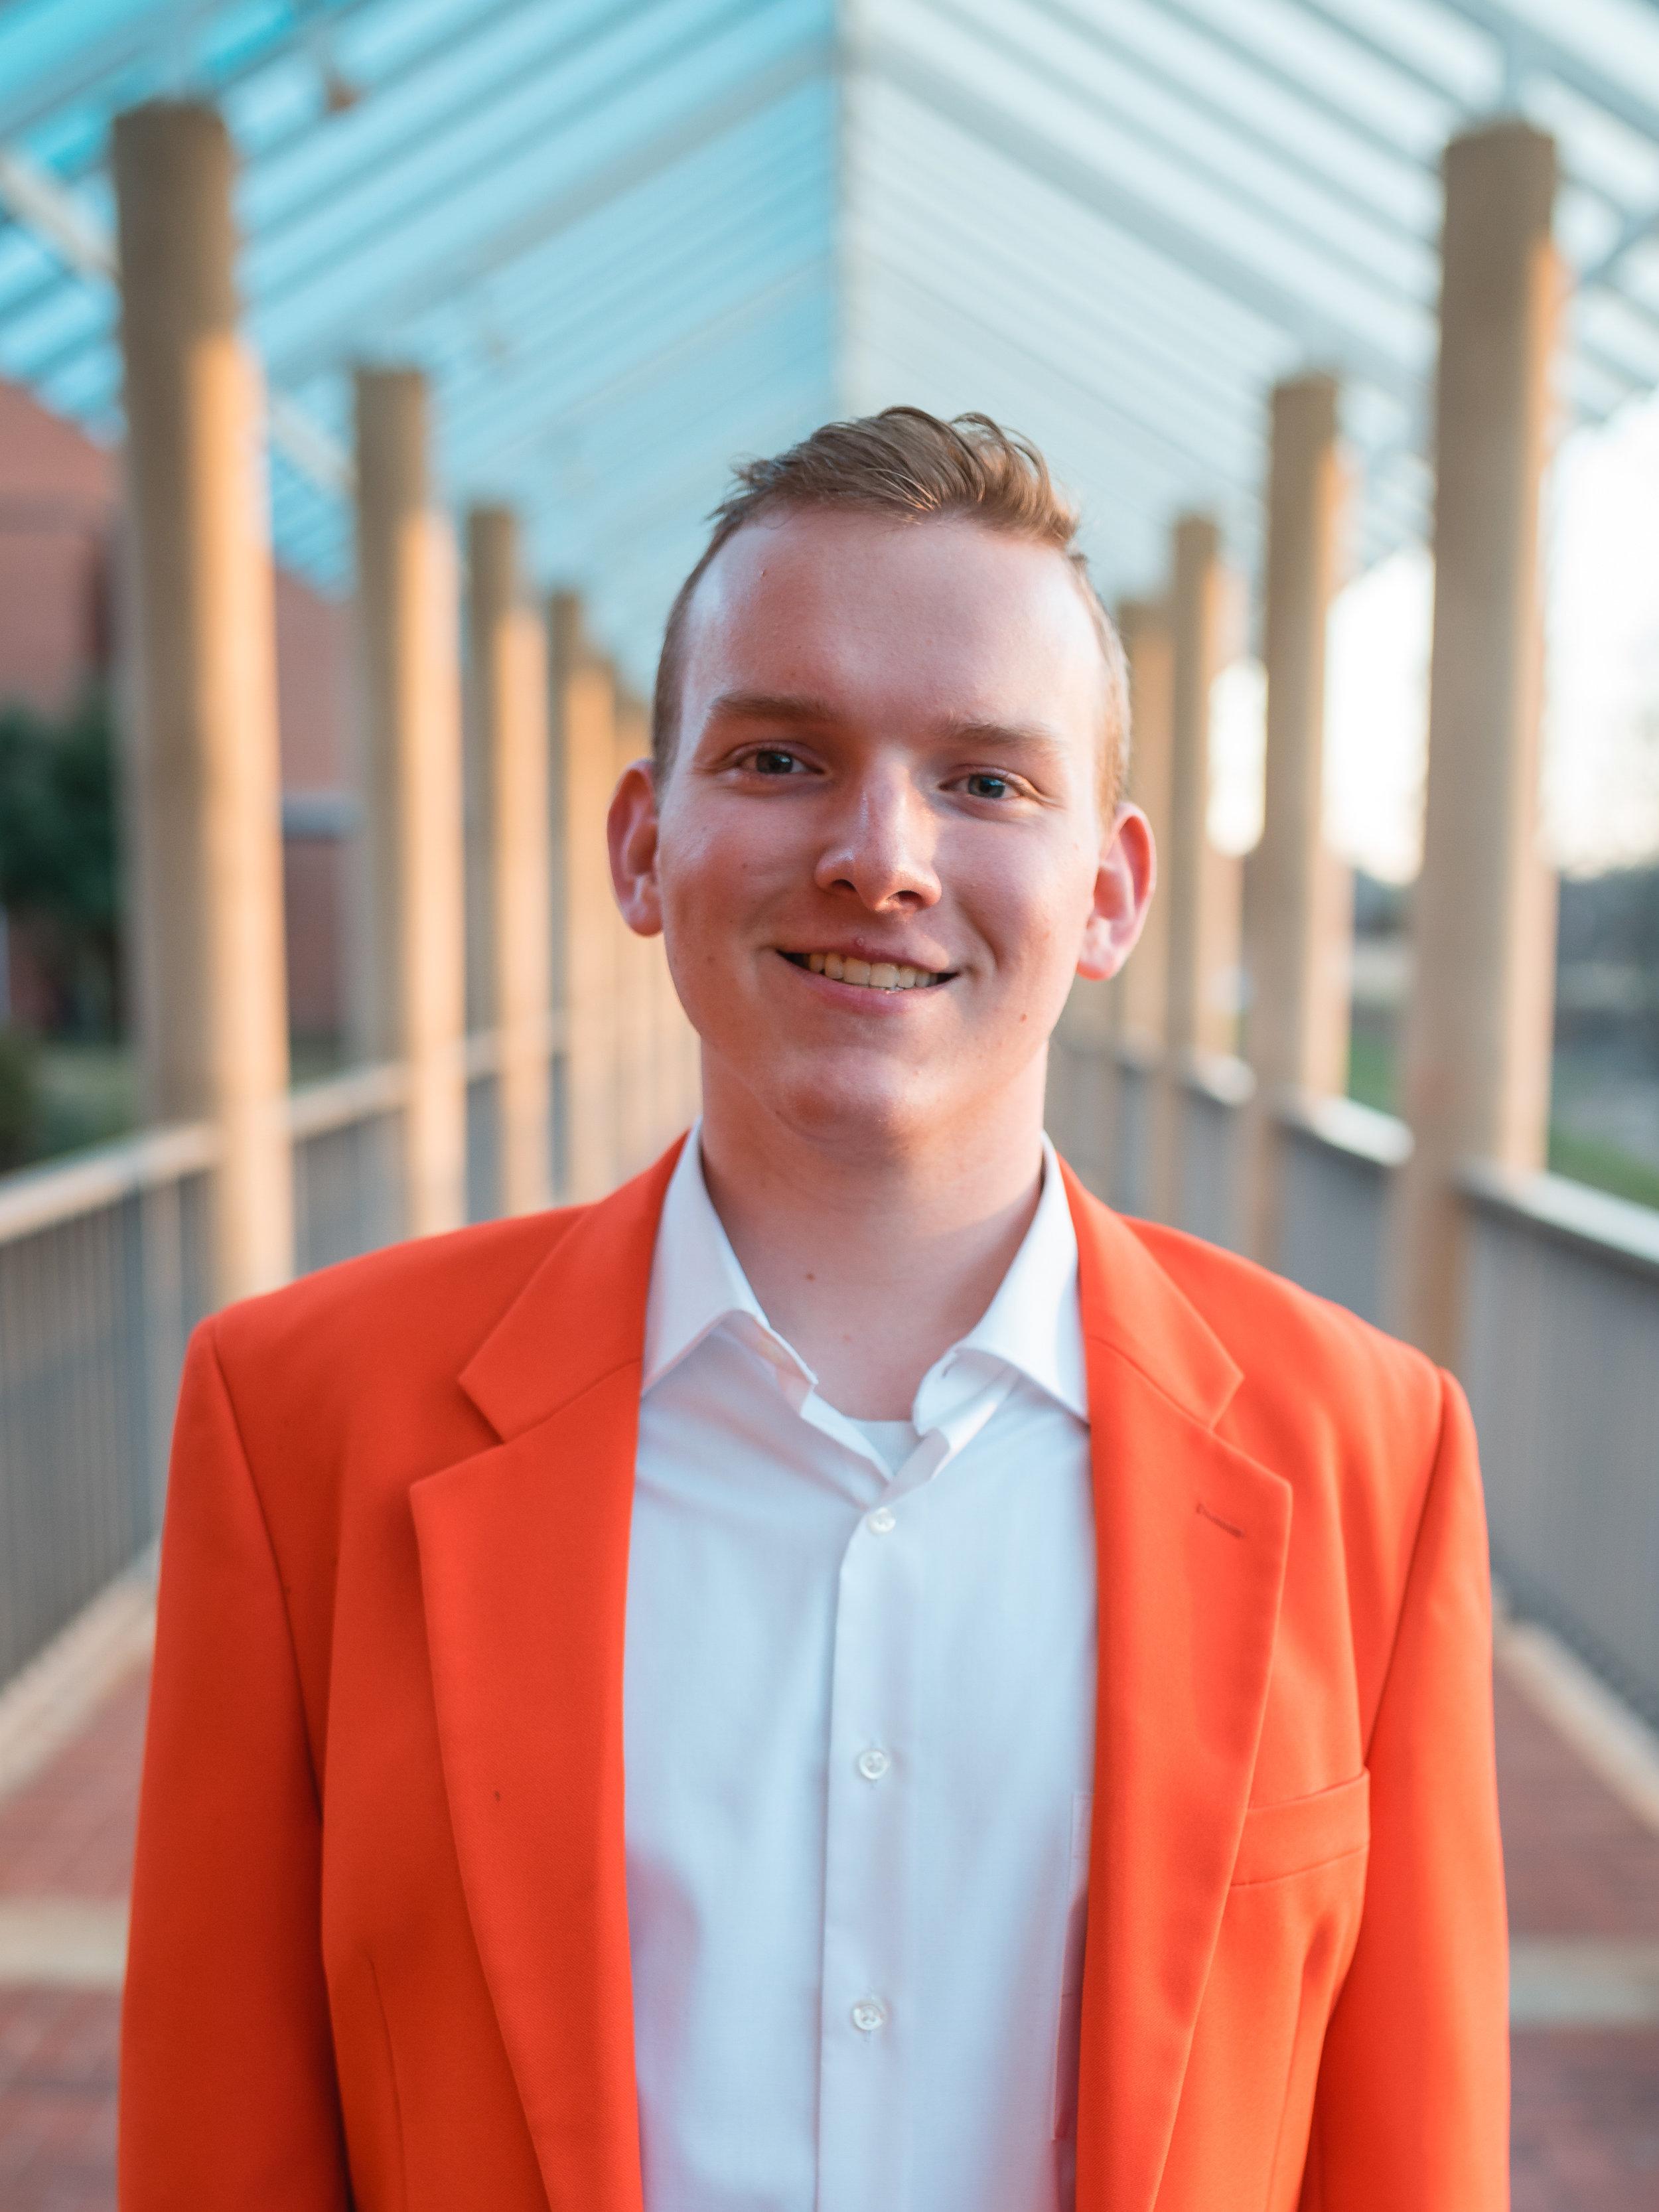 Zachary Jordan, Music Director